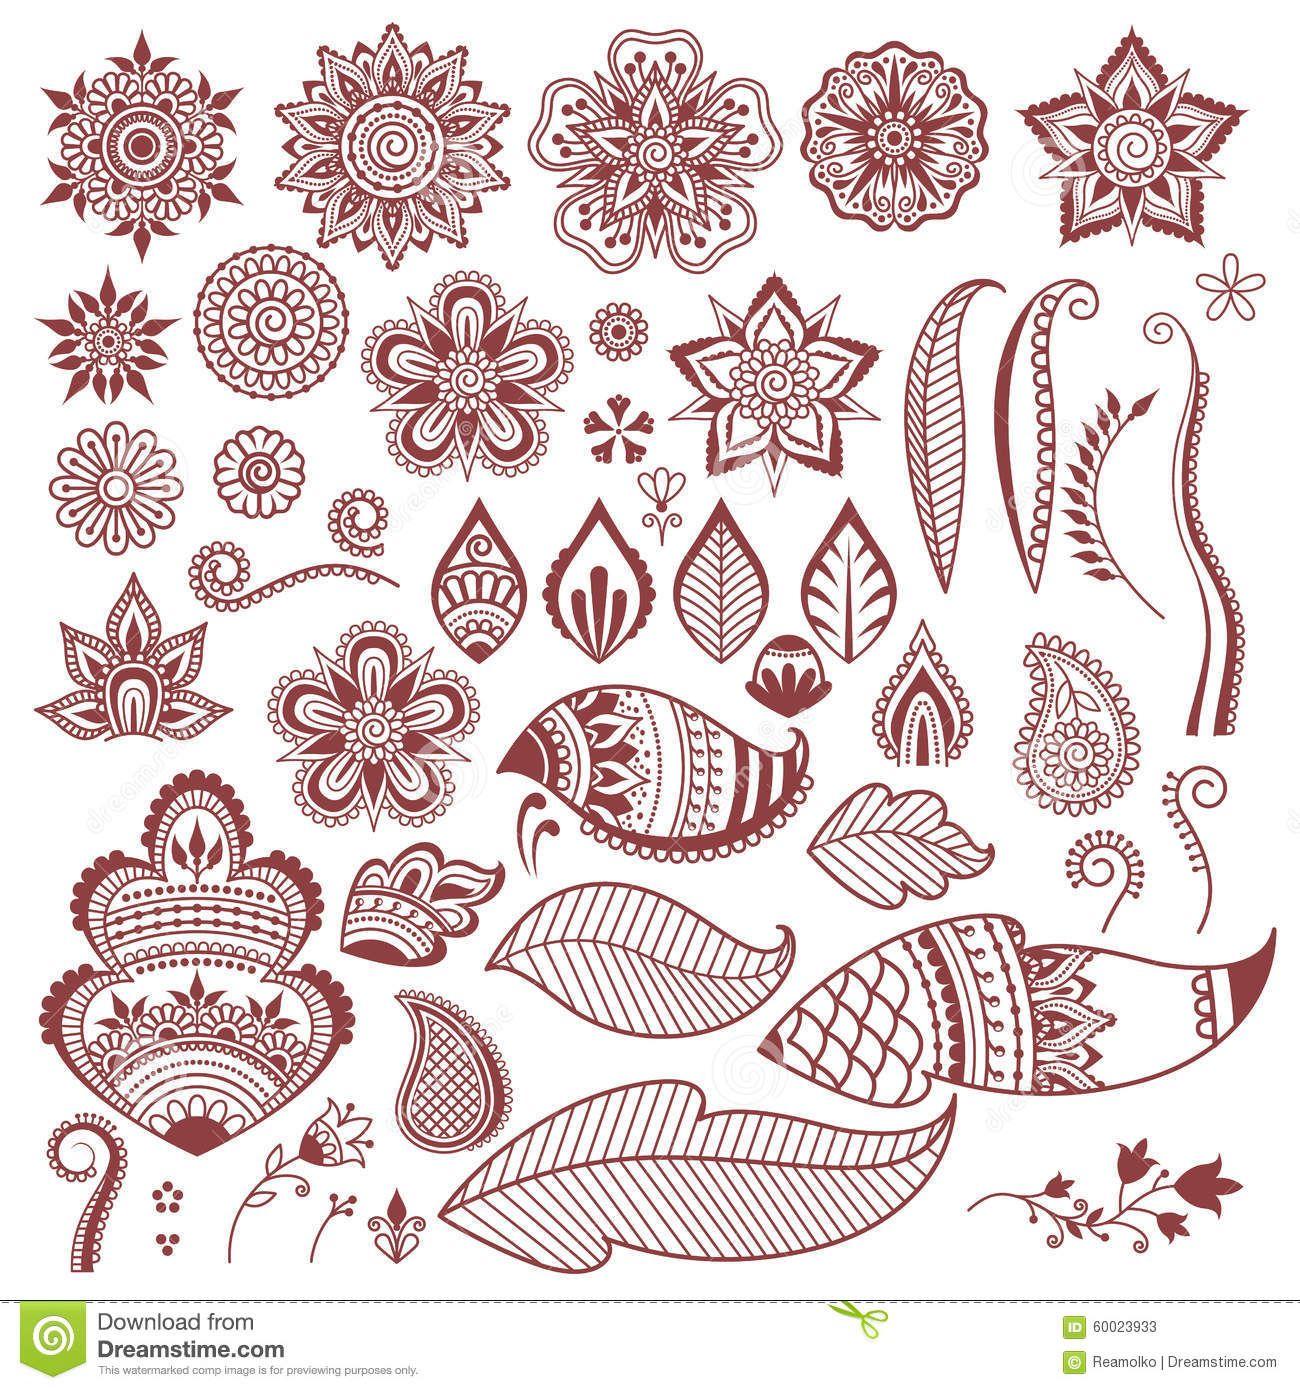 Mehndi Henna Tattoo Flowers And Leaves Henna Zentangle Henna